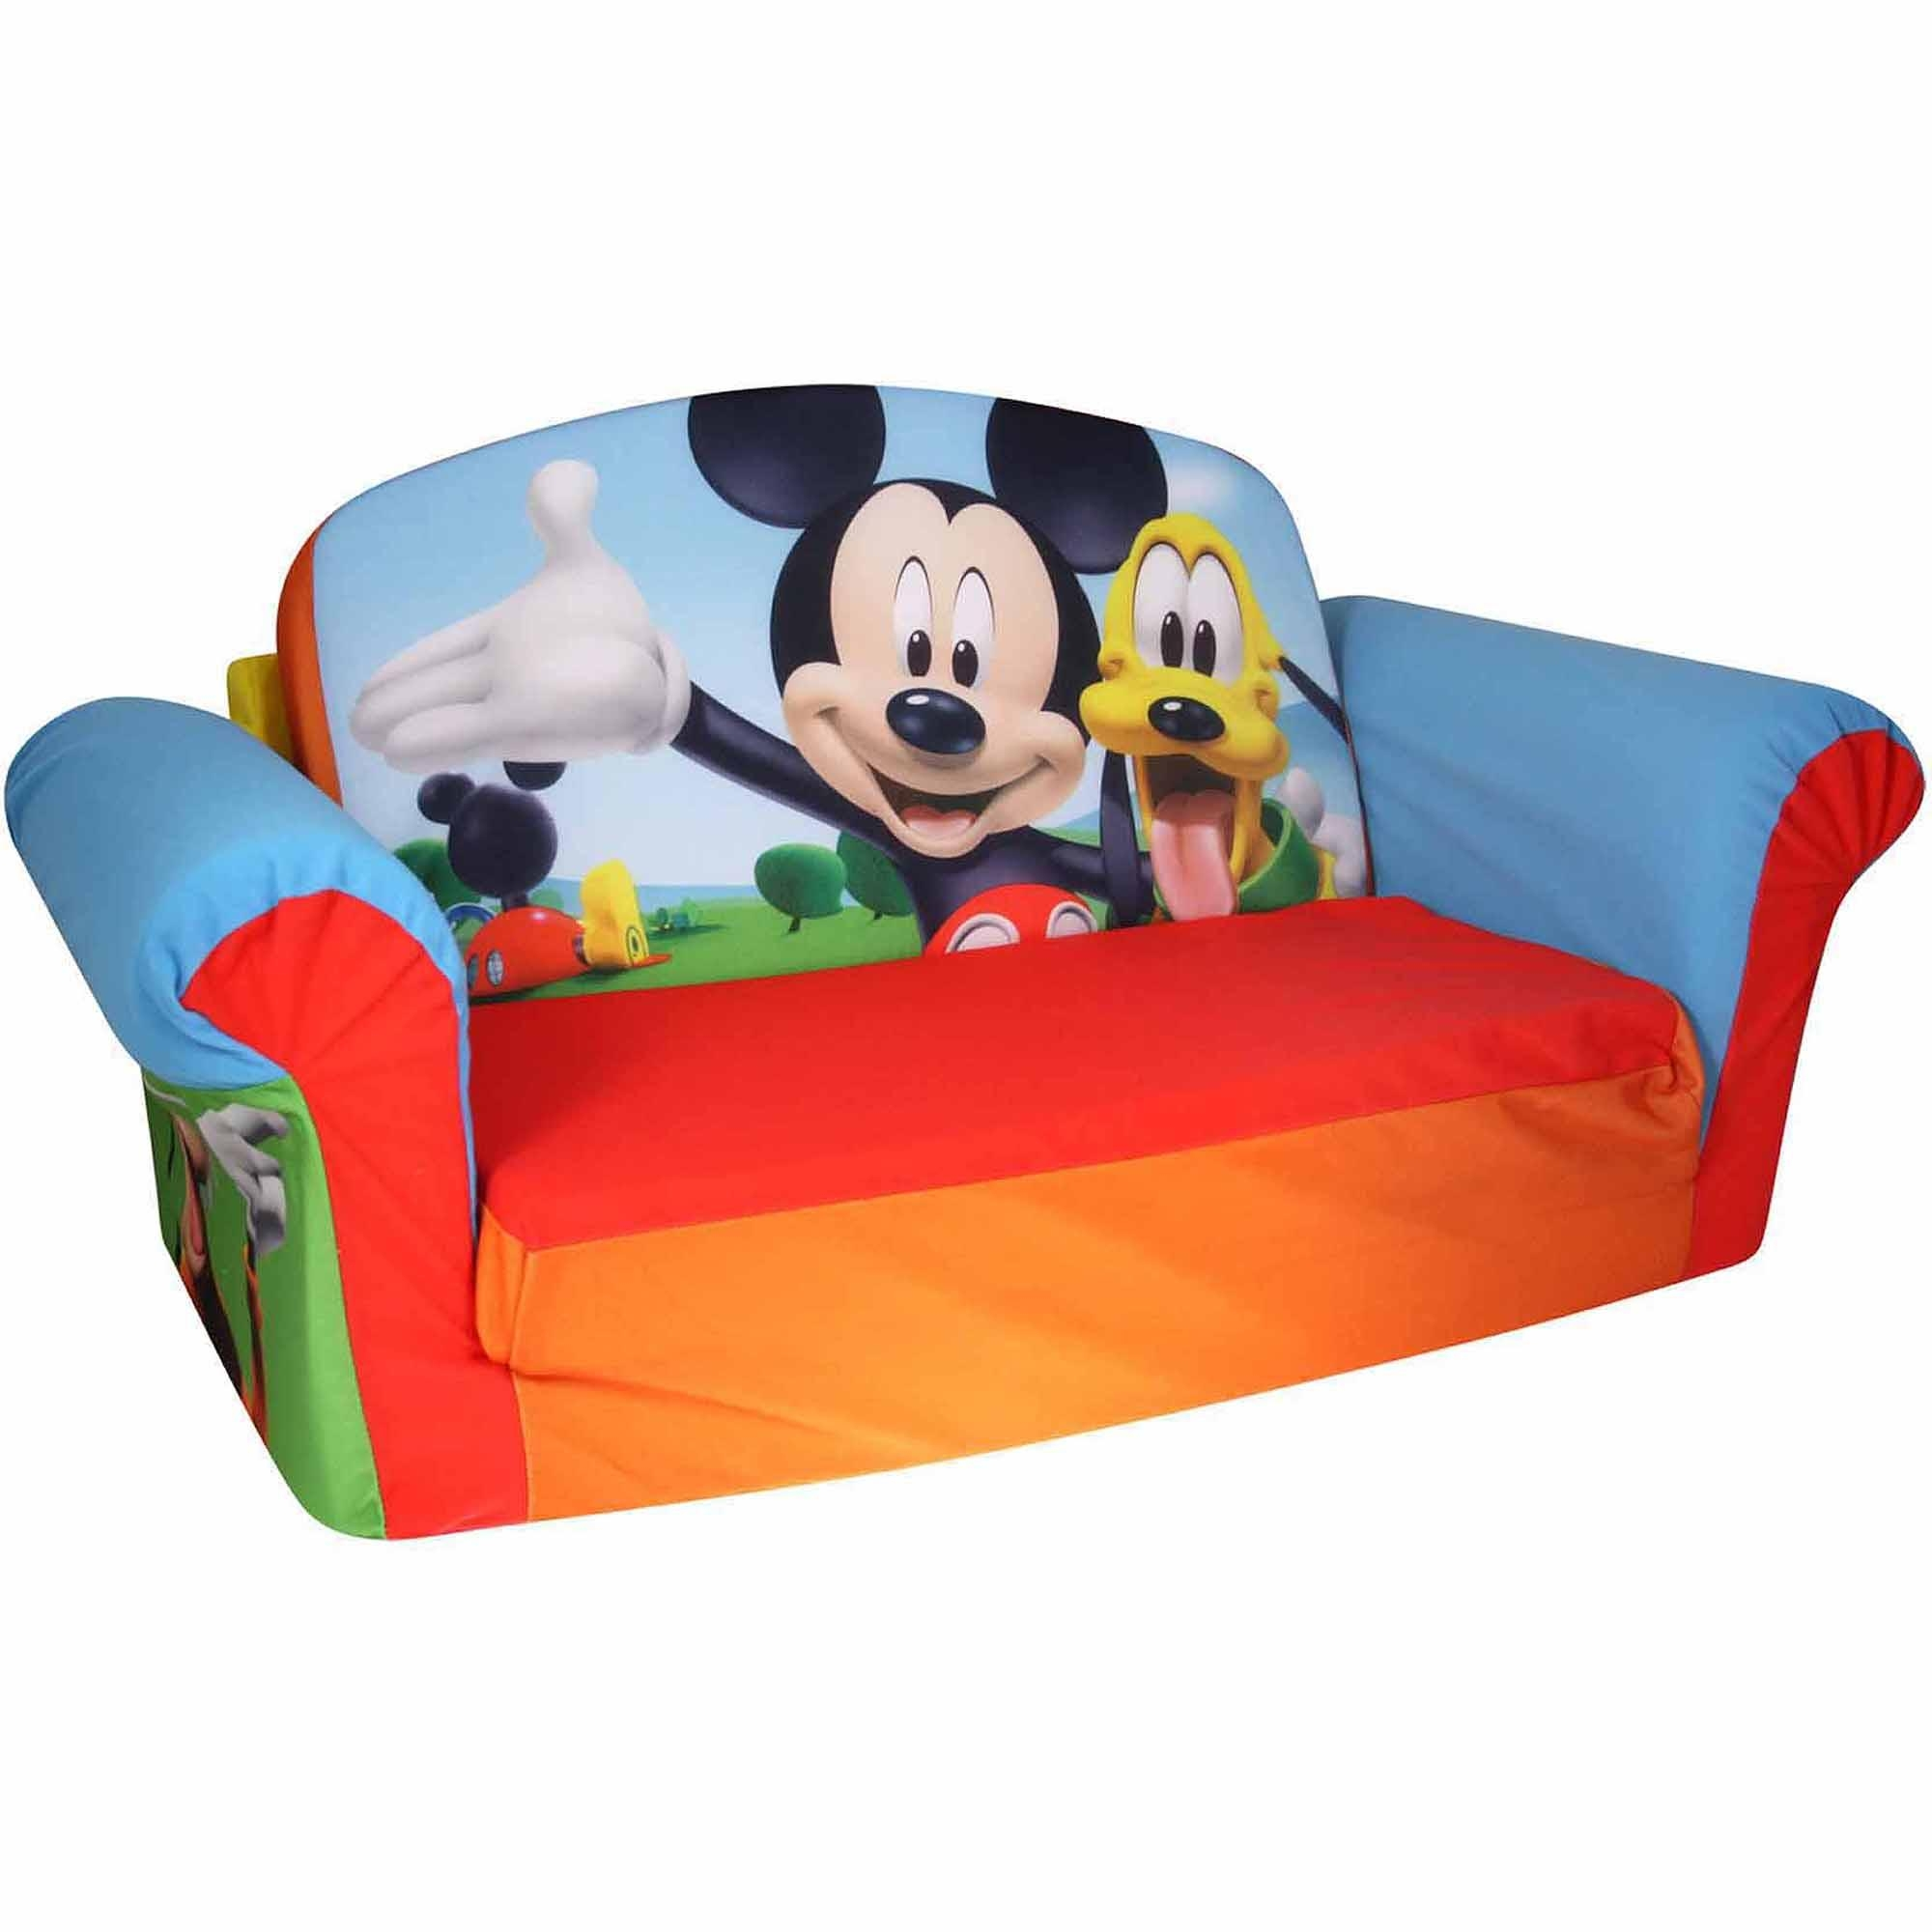 Sofas Center : Outstanding Flip Open Sofa Images Inspirations Regarding Princess Flip Open Sofas (Image 16 of 20)